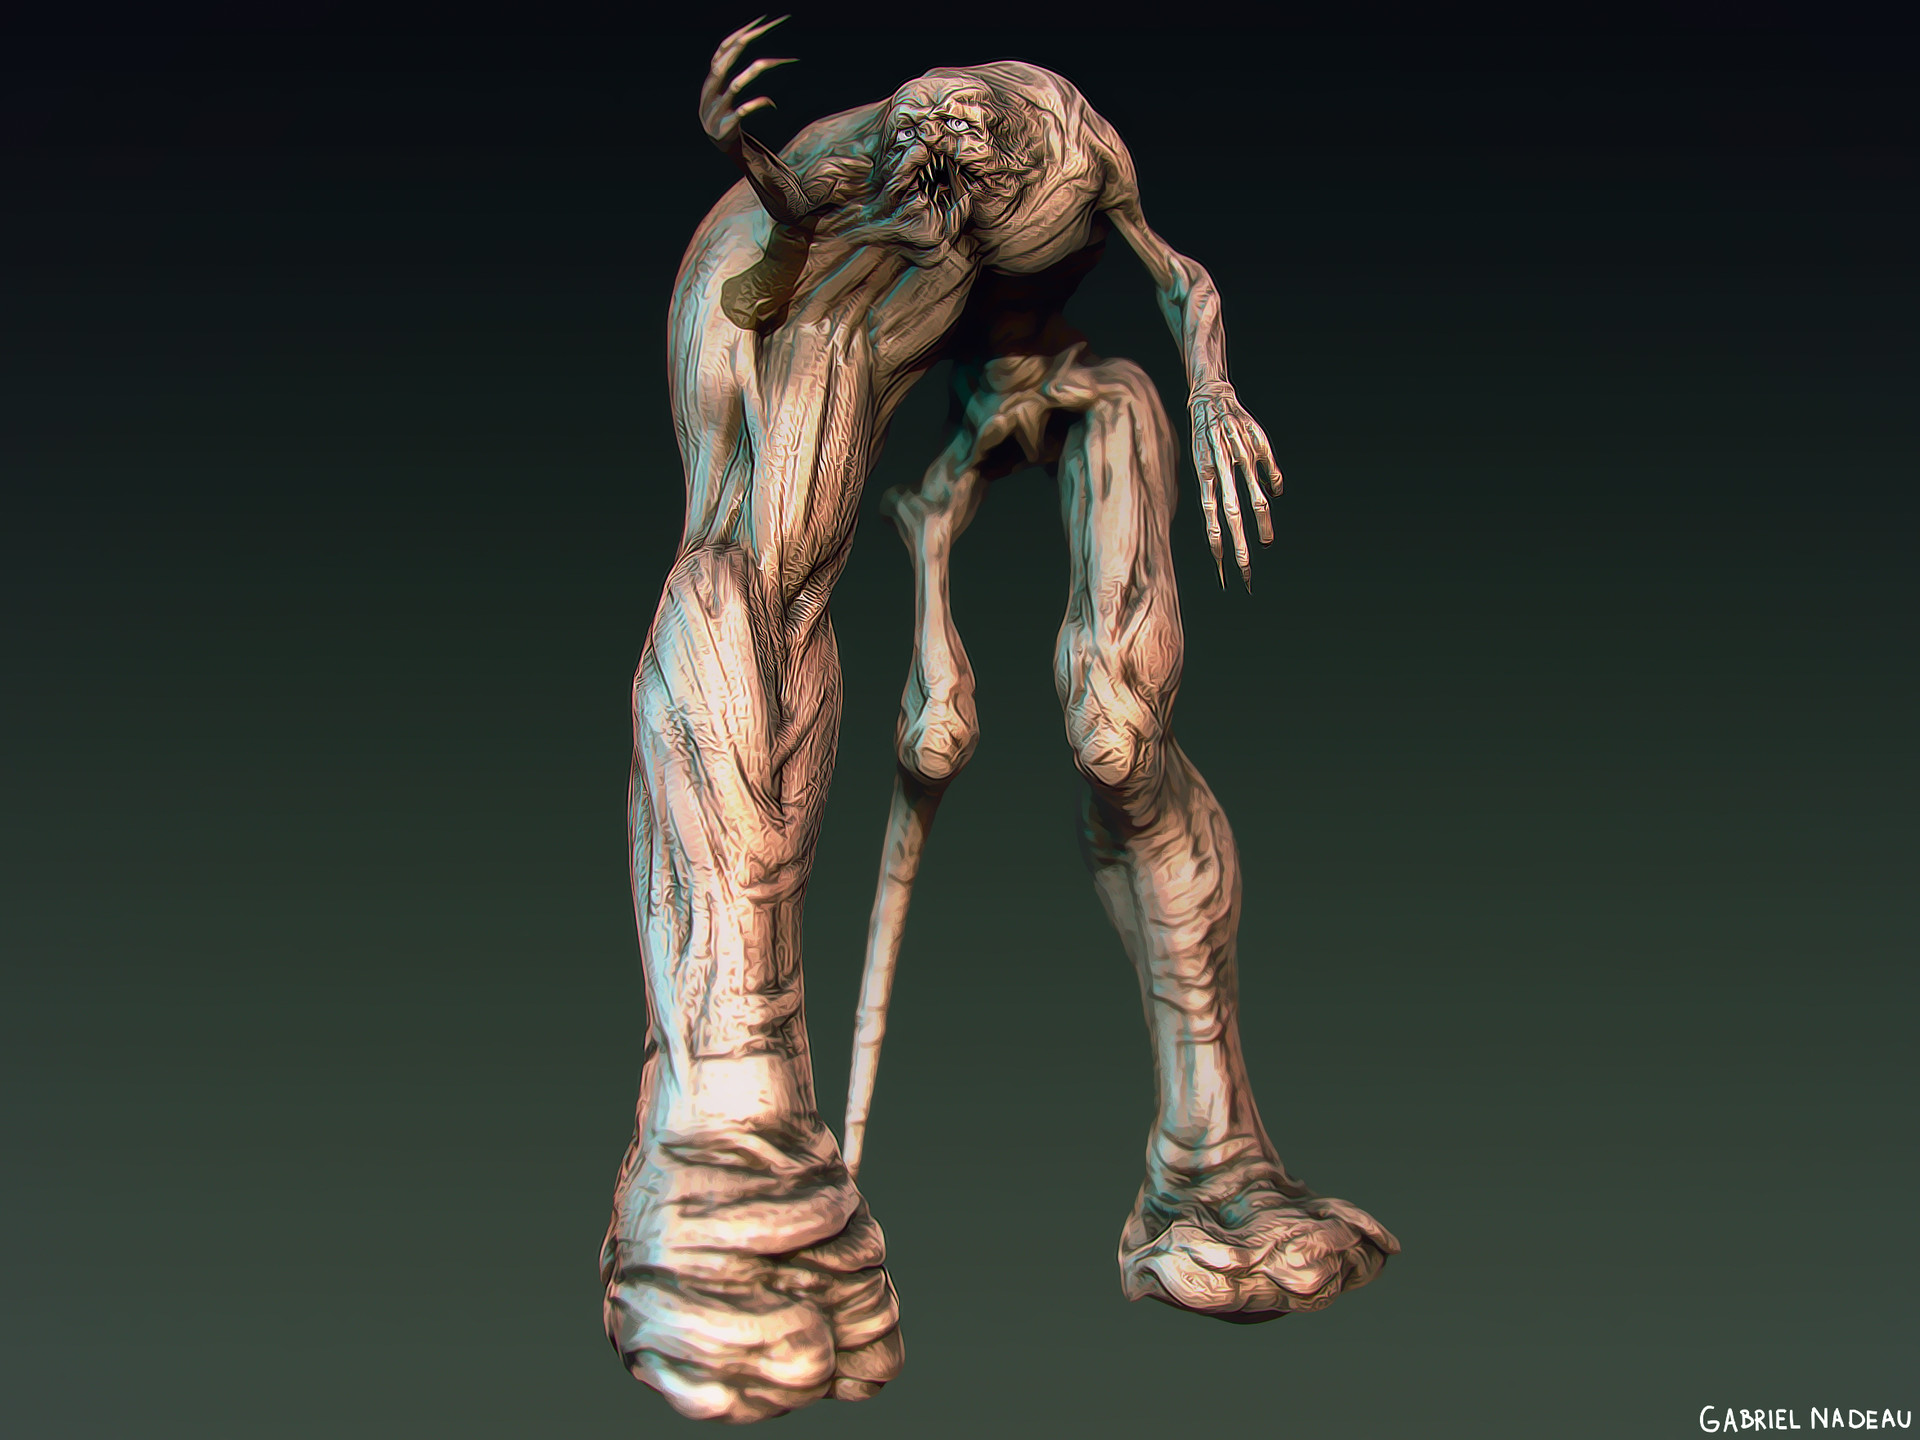 Gabriel nadeau monstre 1